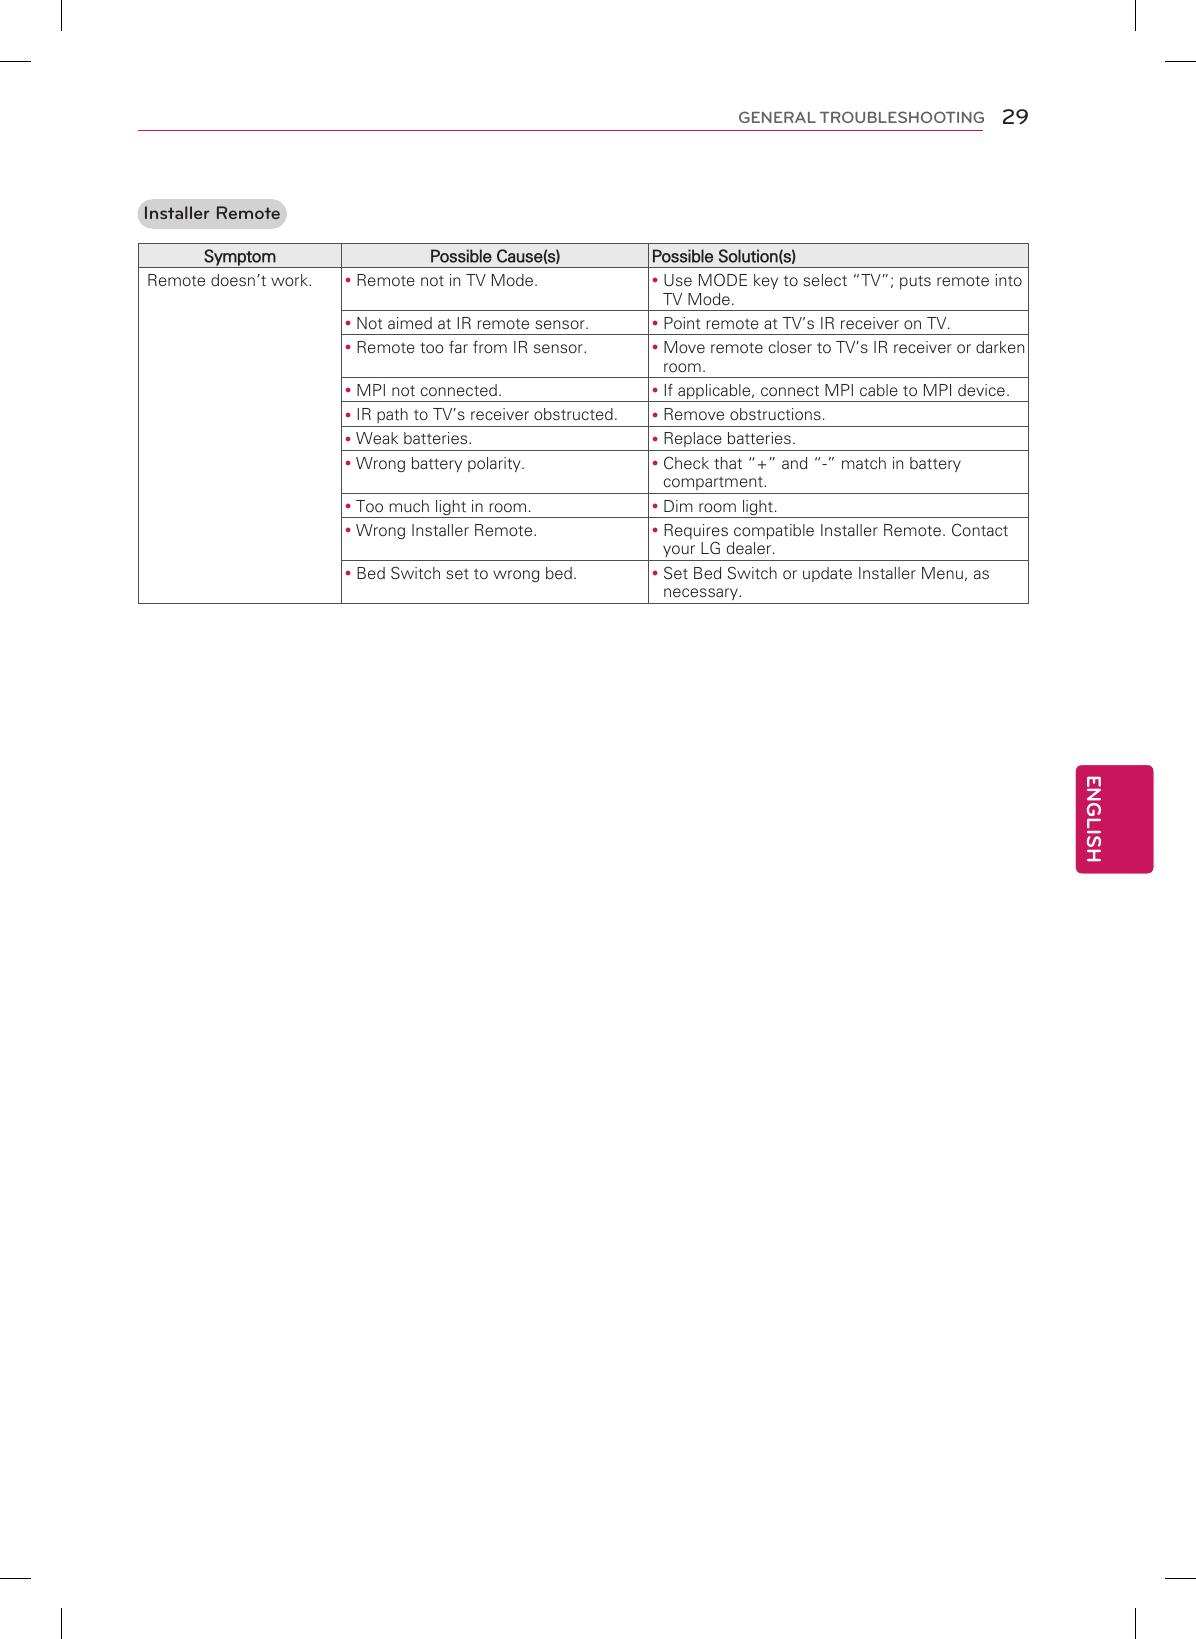 LG 32LT770H LT670H_LT770H_LT671H_LT673H UA User Manual Owner's